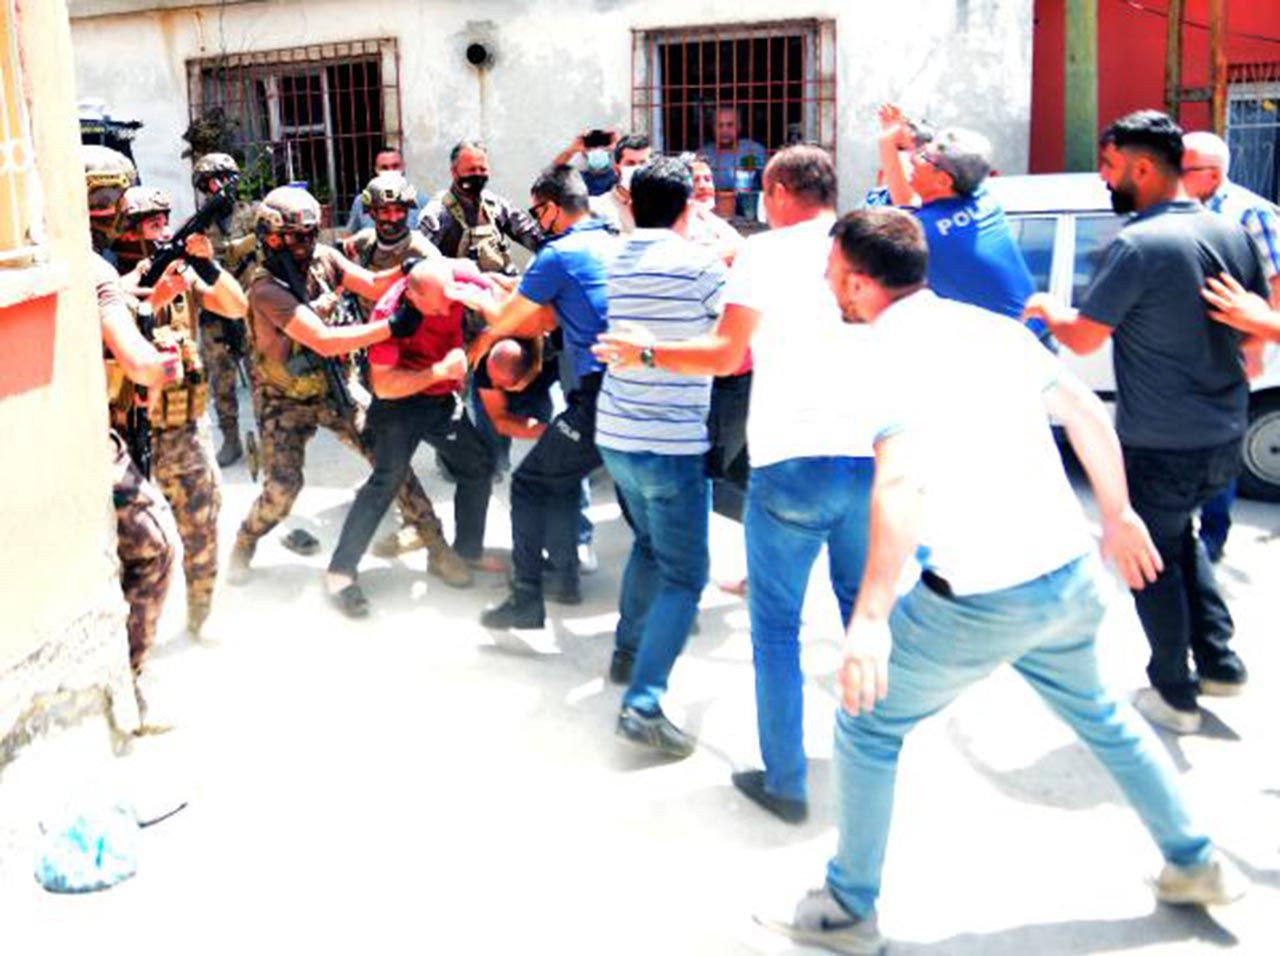 Mahalleyi ayağa kaldırdı: Linçten polis kurtardı - Resim: 2